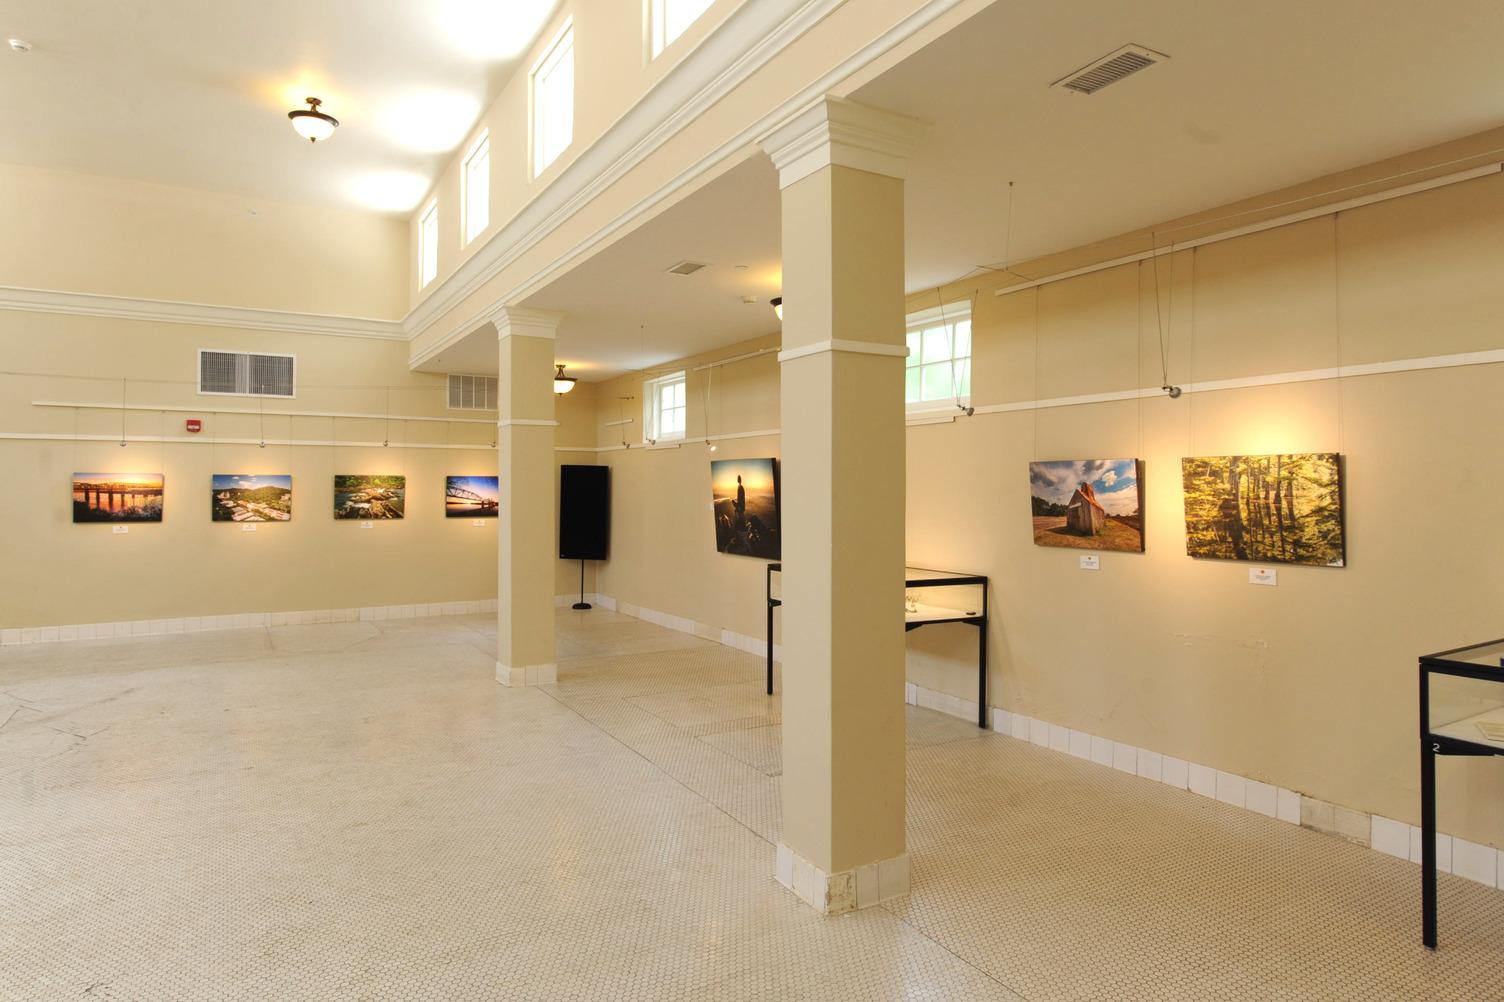 gallery opening - Ozark Bathhouse Aug 2021